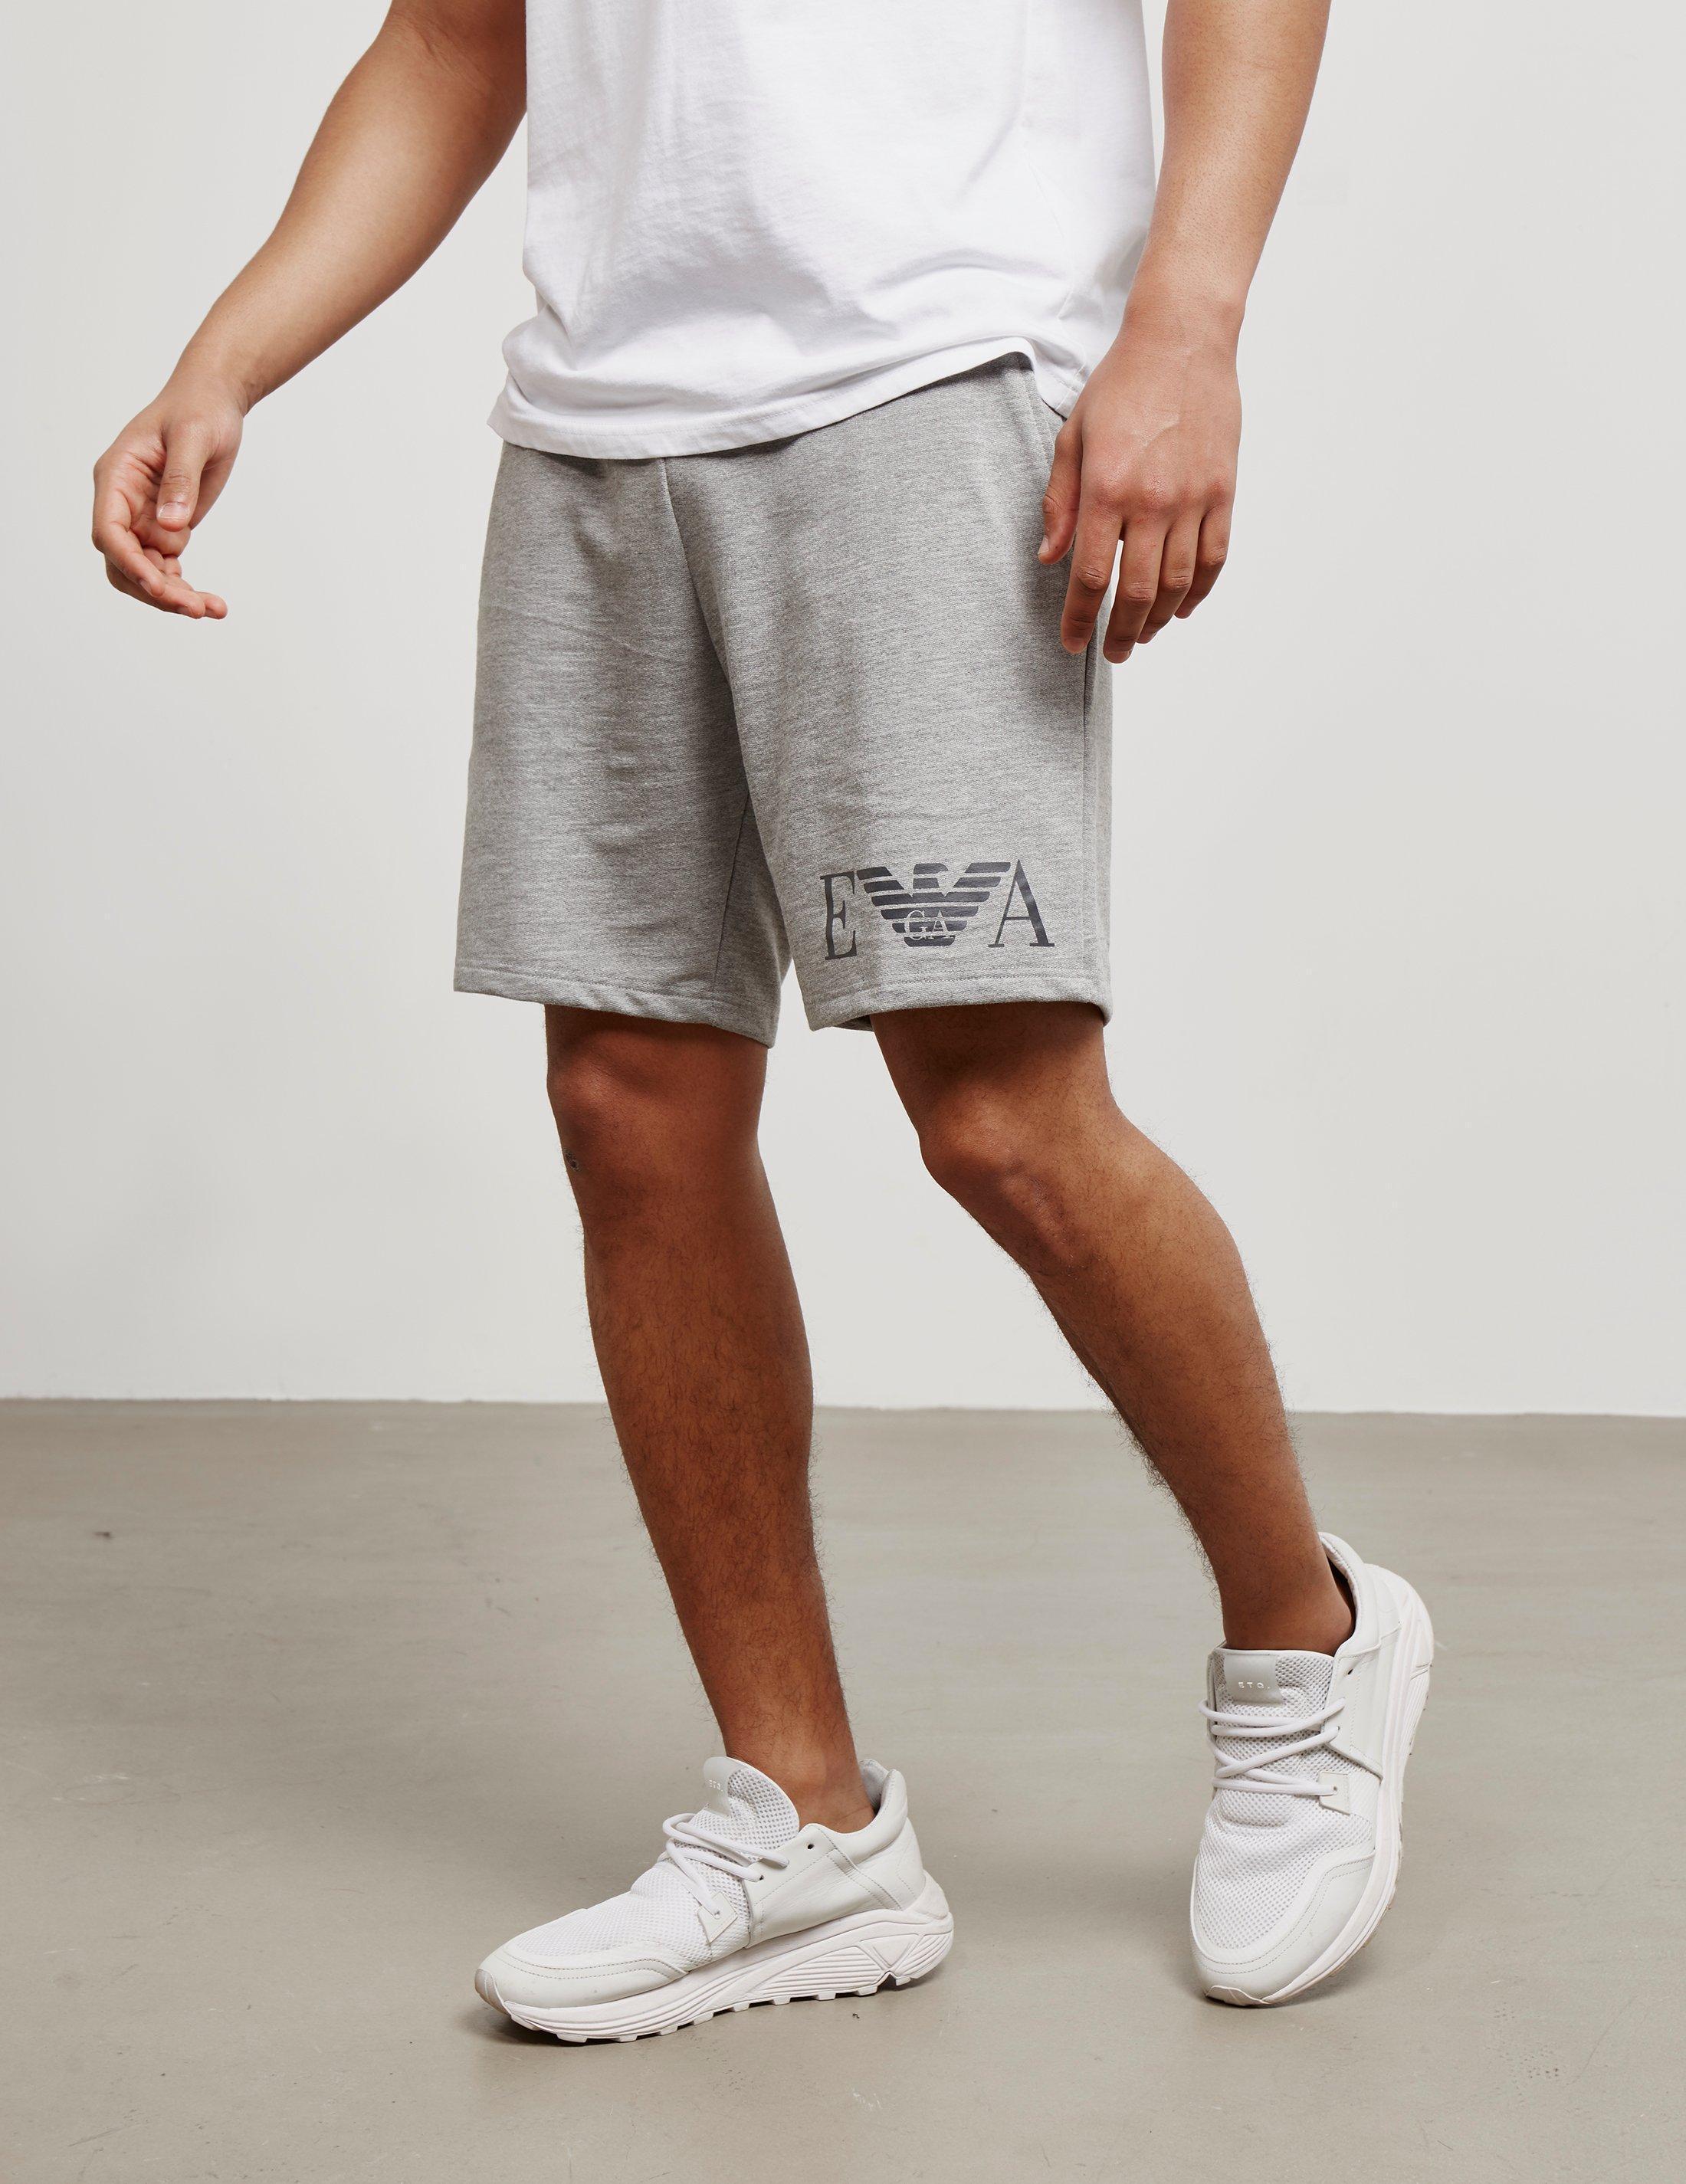 42982262f Lyst - Emporio Armani Logo Fleece Shorts Grey in Gray for Men